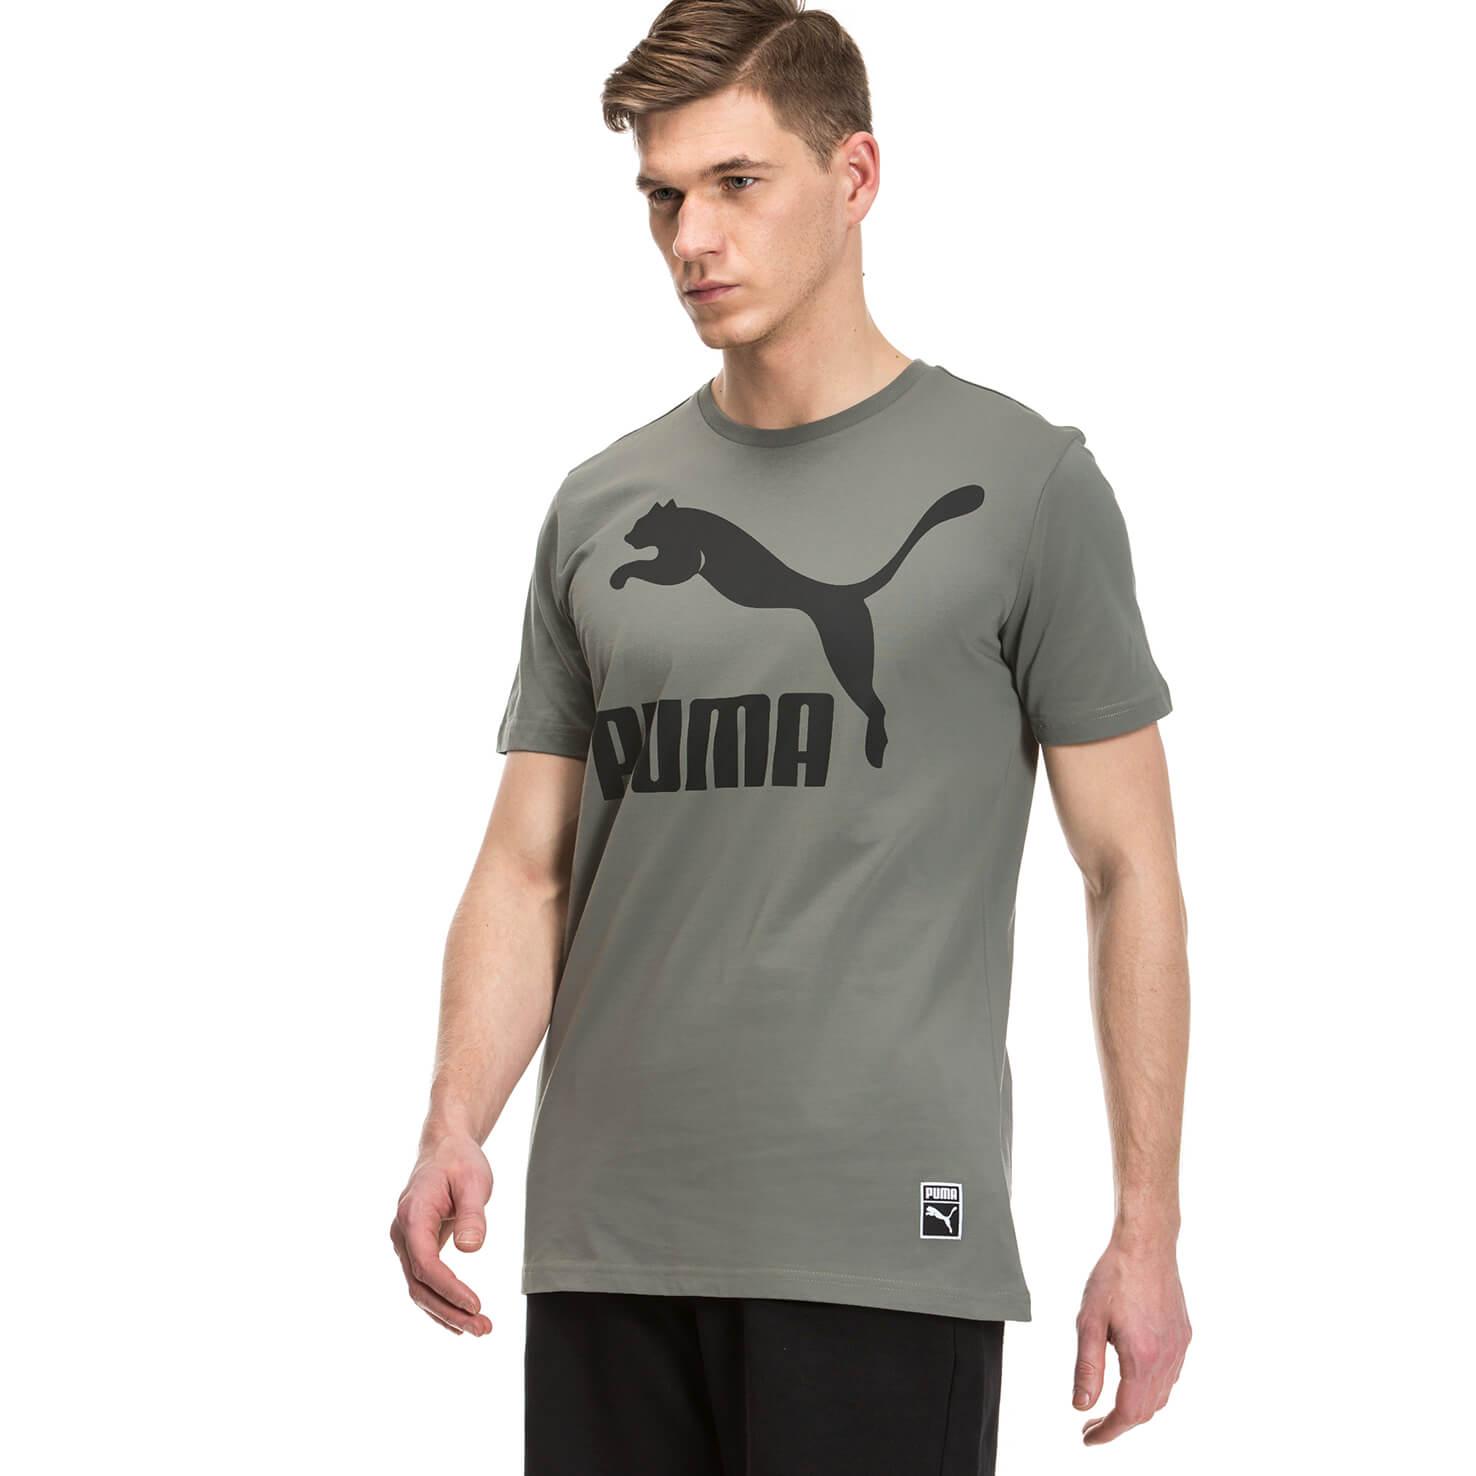 Puma Archieve Logo Erkek Gri Tshirt